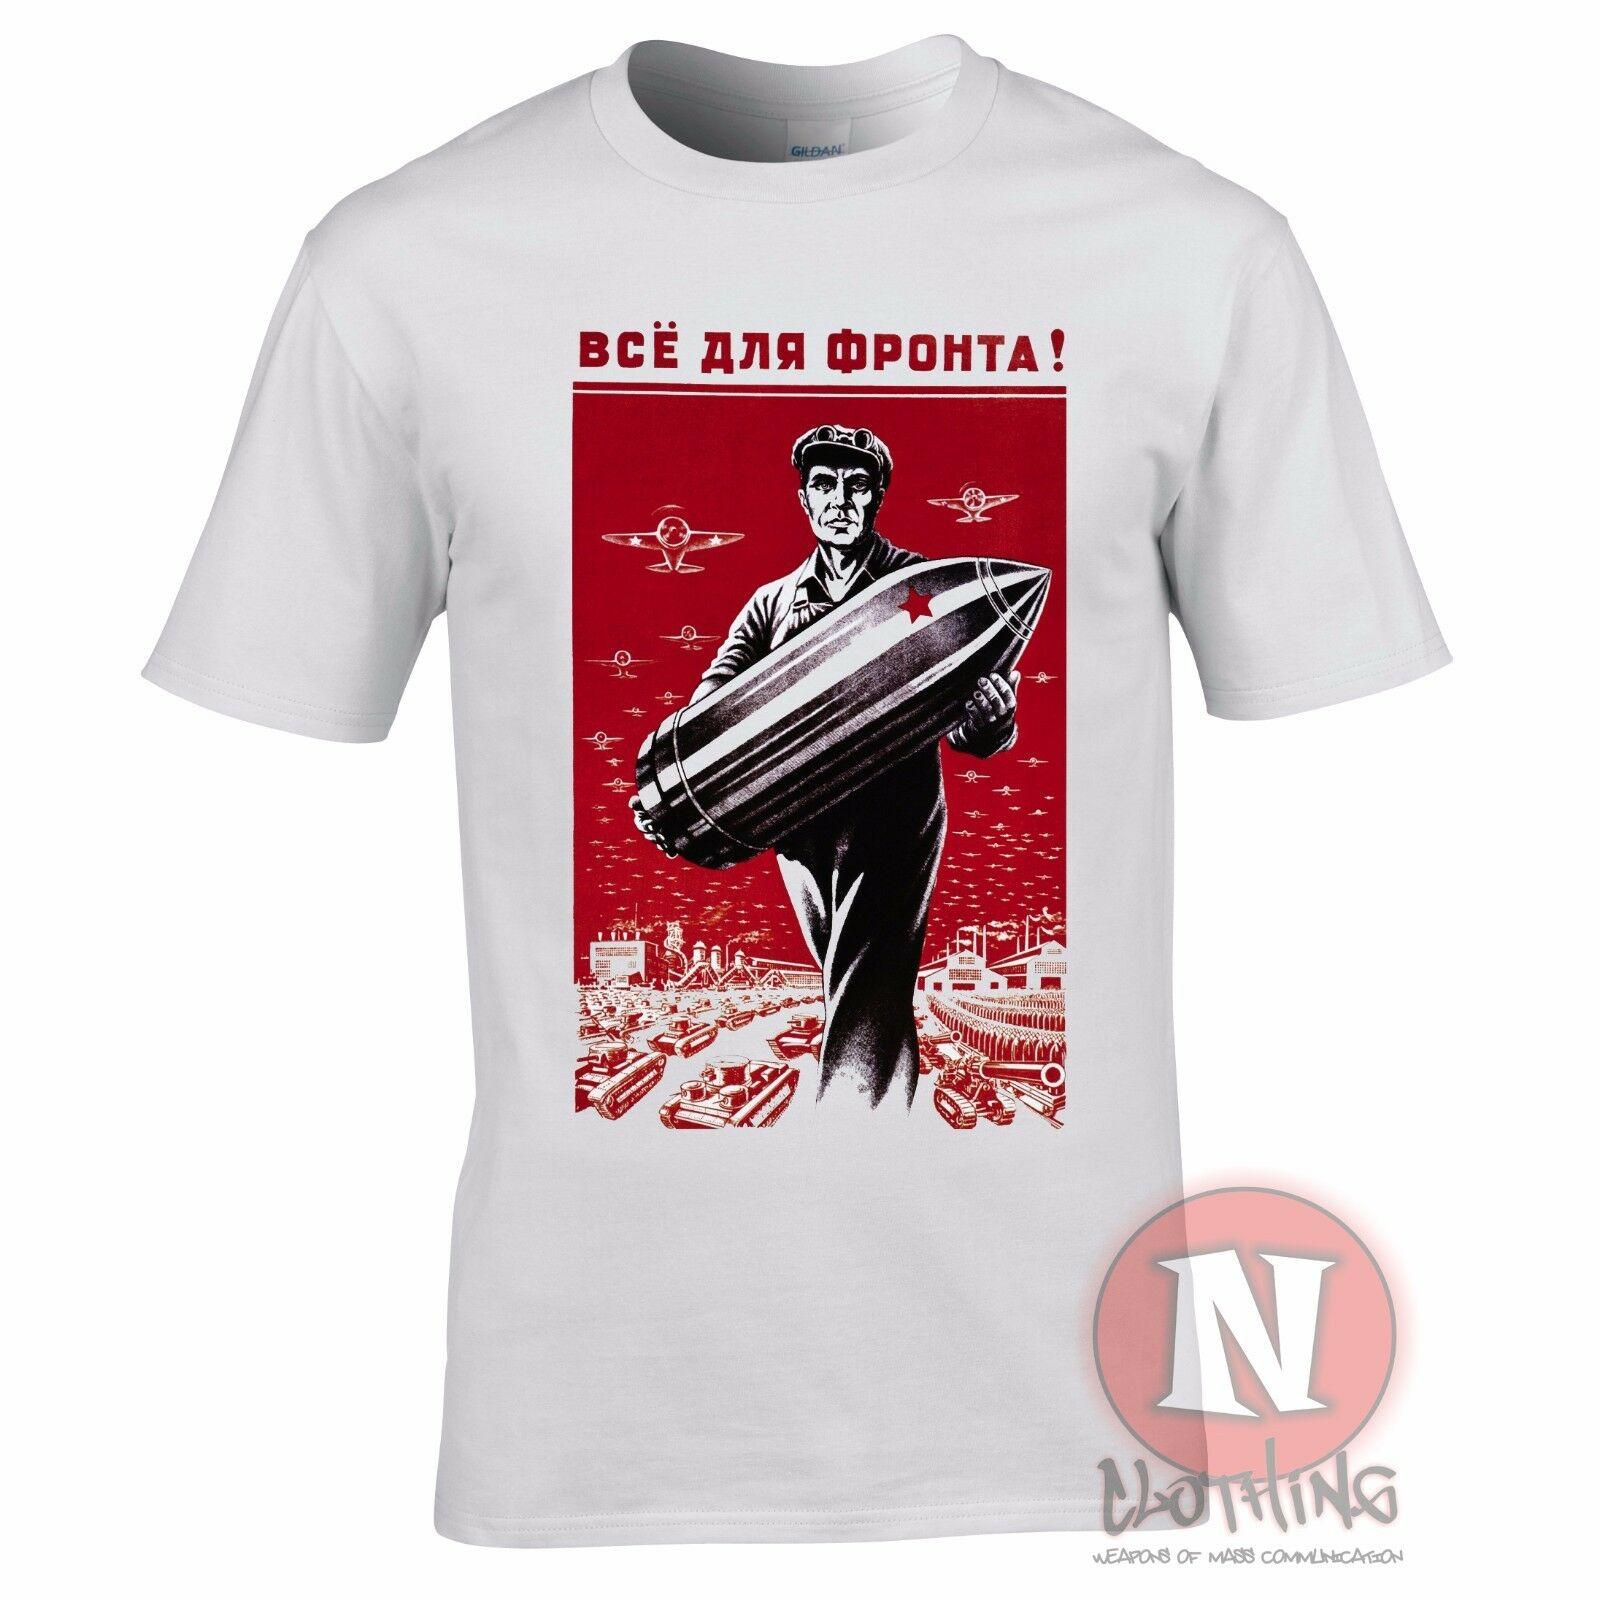 La guerra mundial 2 propaganda rusa camiseta de la historia militar de la Segunda Guerra Mundial munición soviética WW2